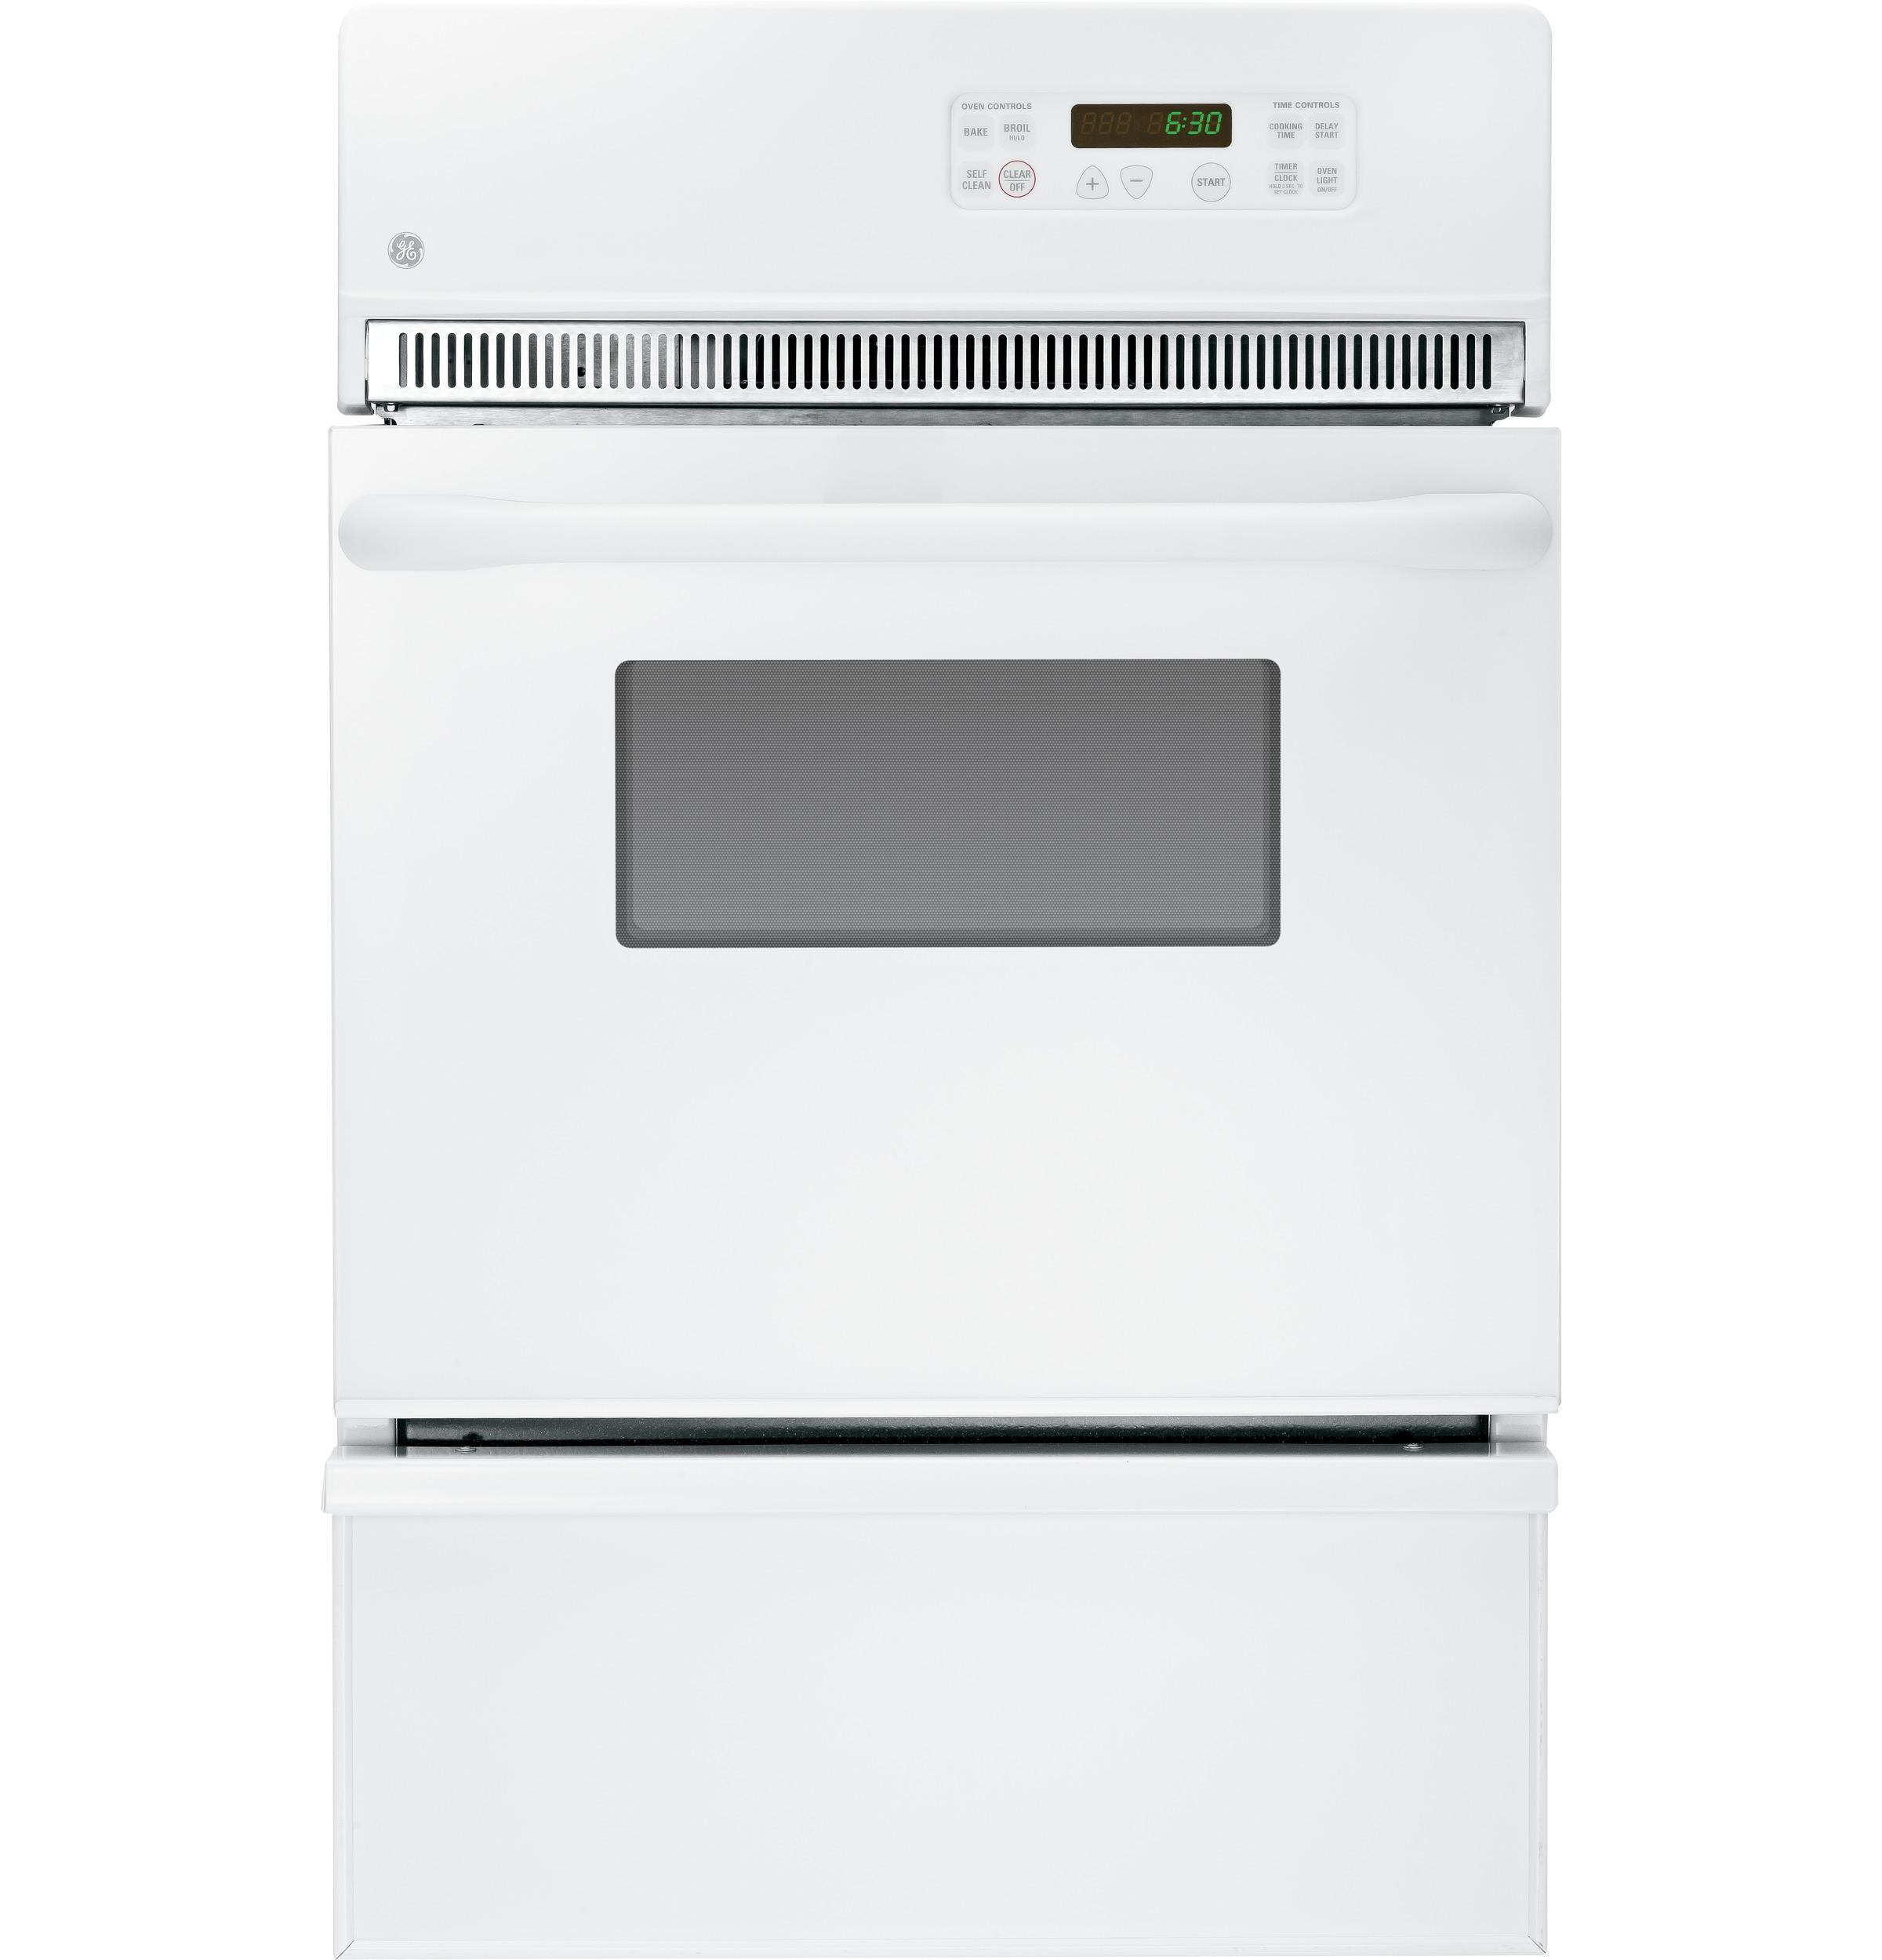 "Model: JGRP20WEJWW | GE GE® 24"" Built-In Gas Oven"